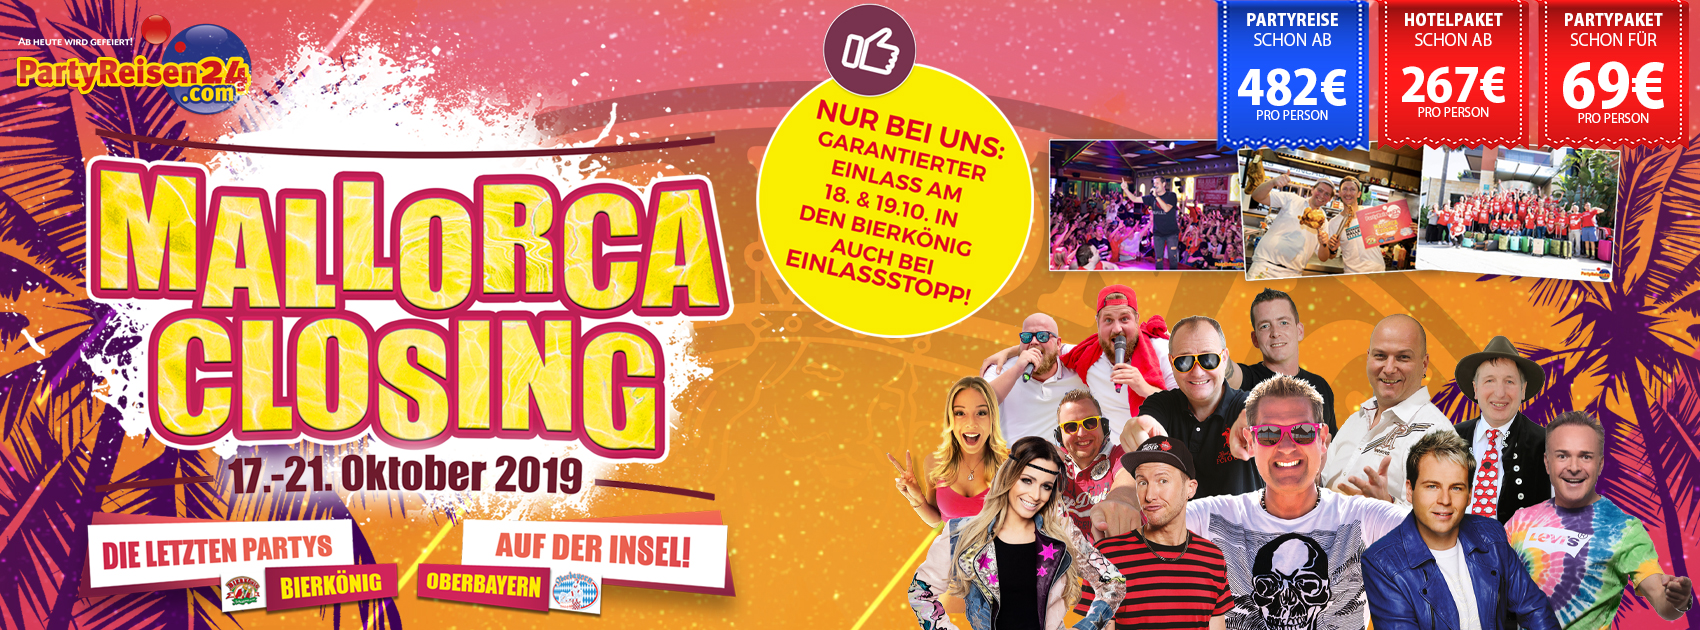 bierkönig preise 2019